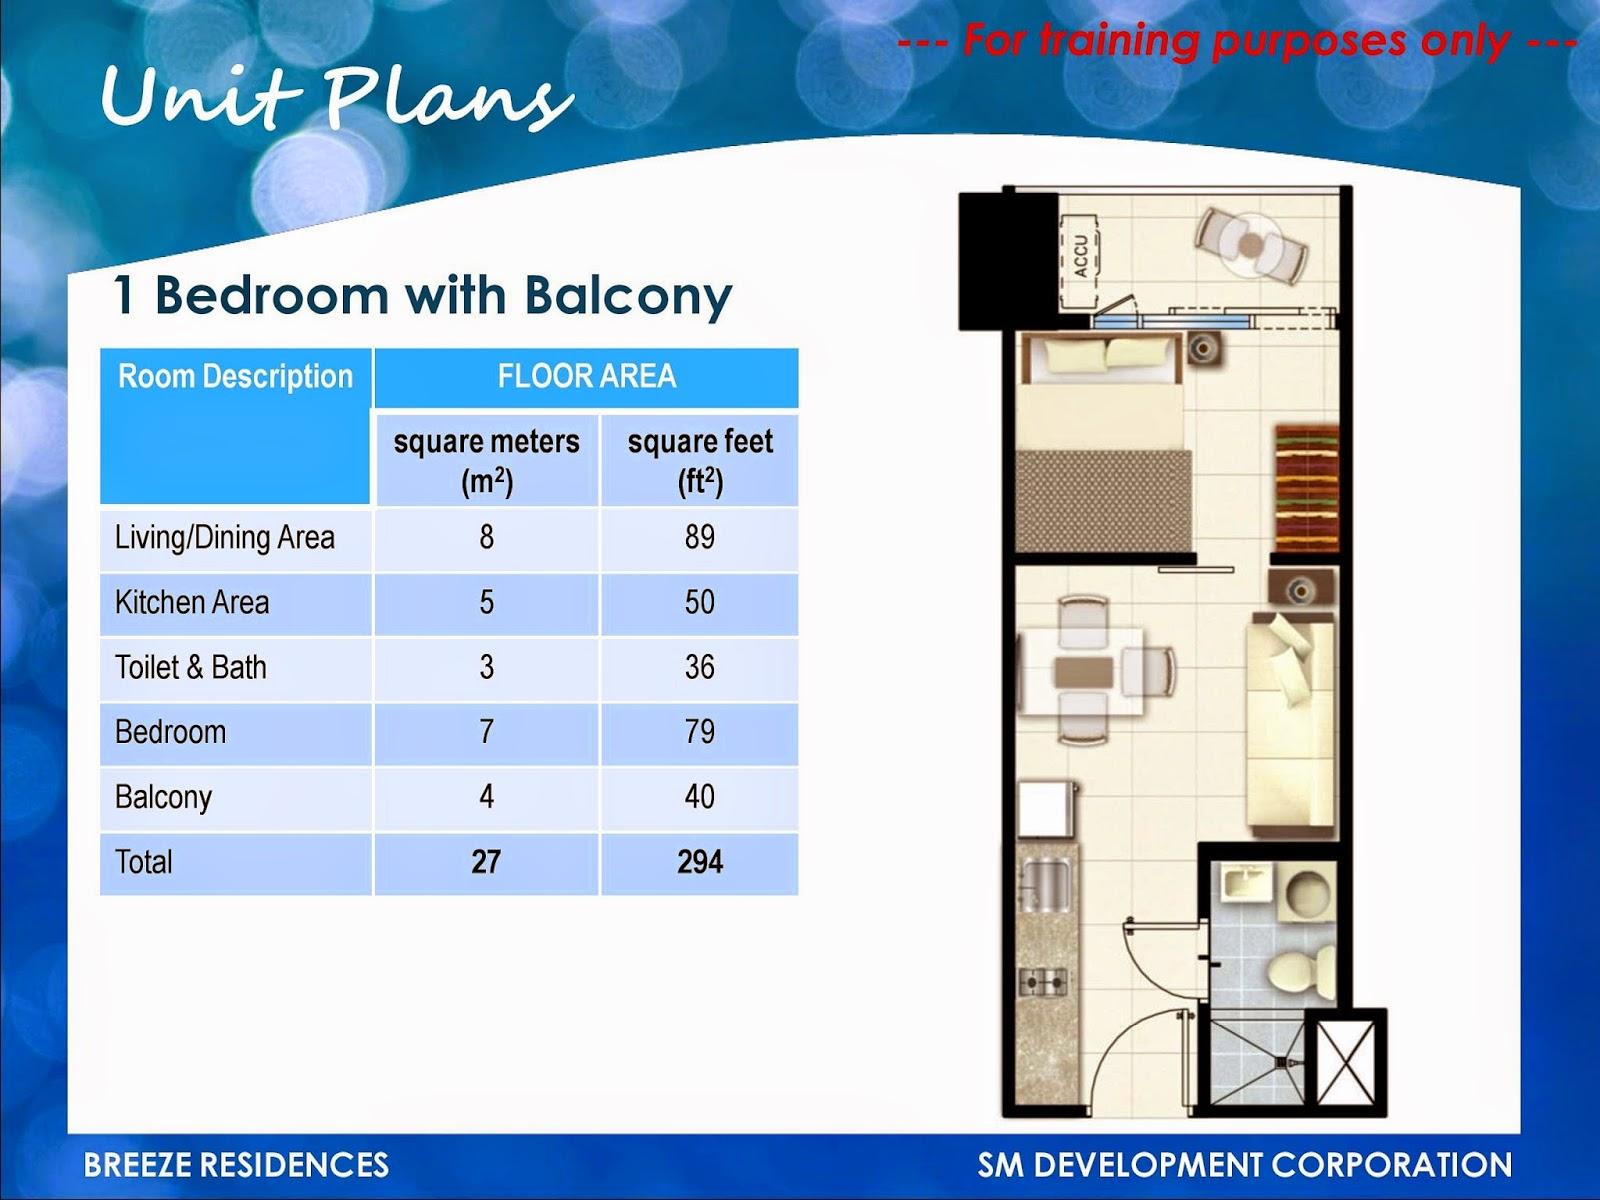 Breeze Residences - Roxas, Blvd. Pasay City